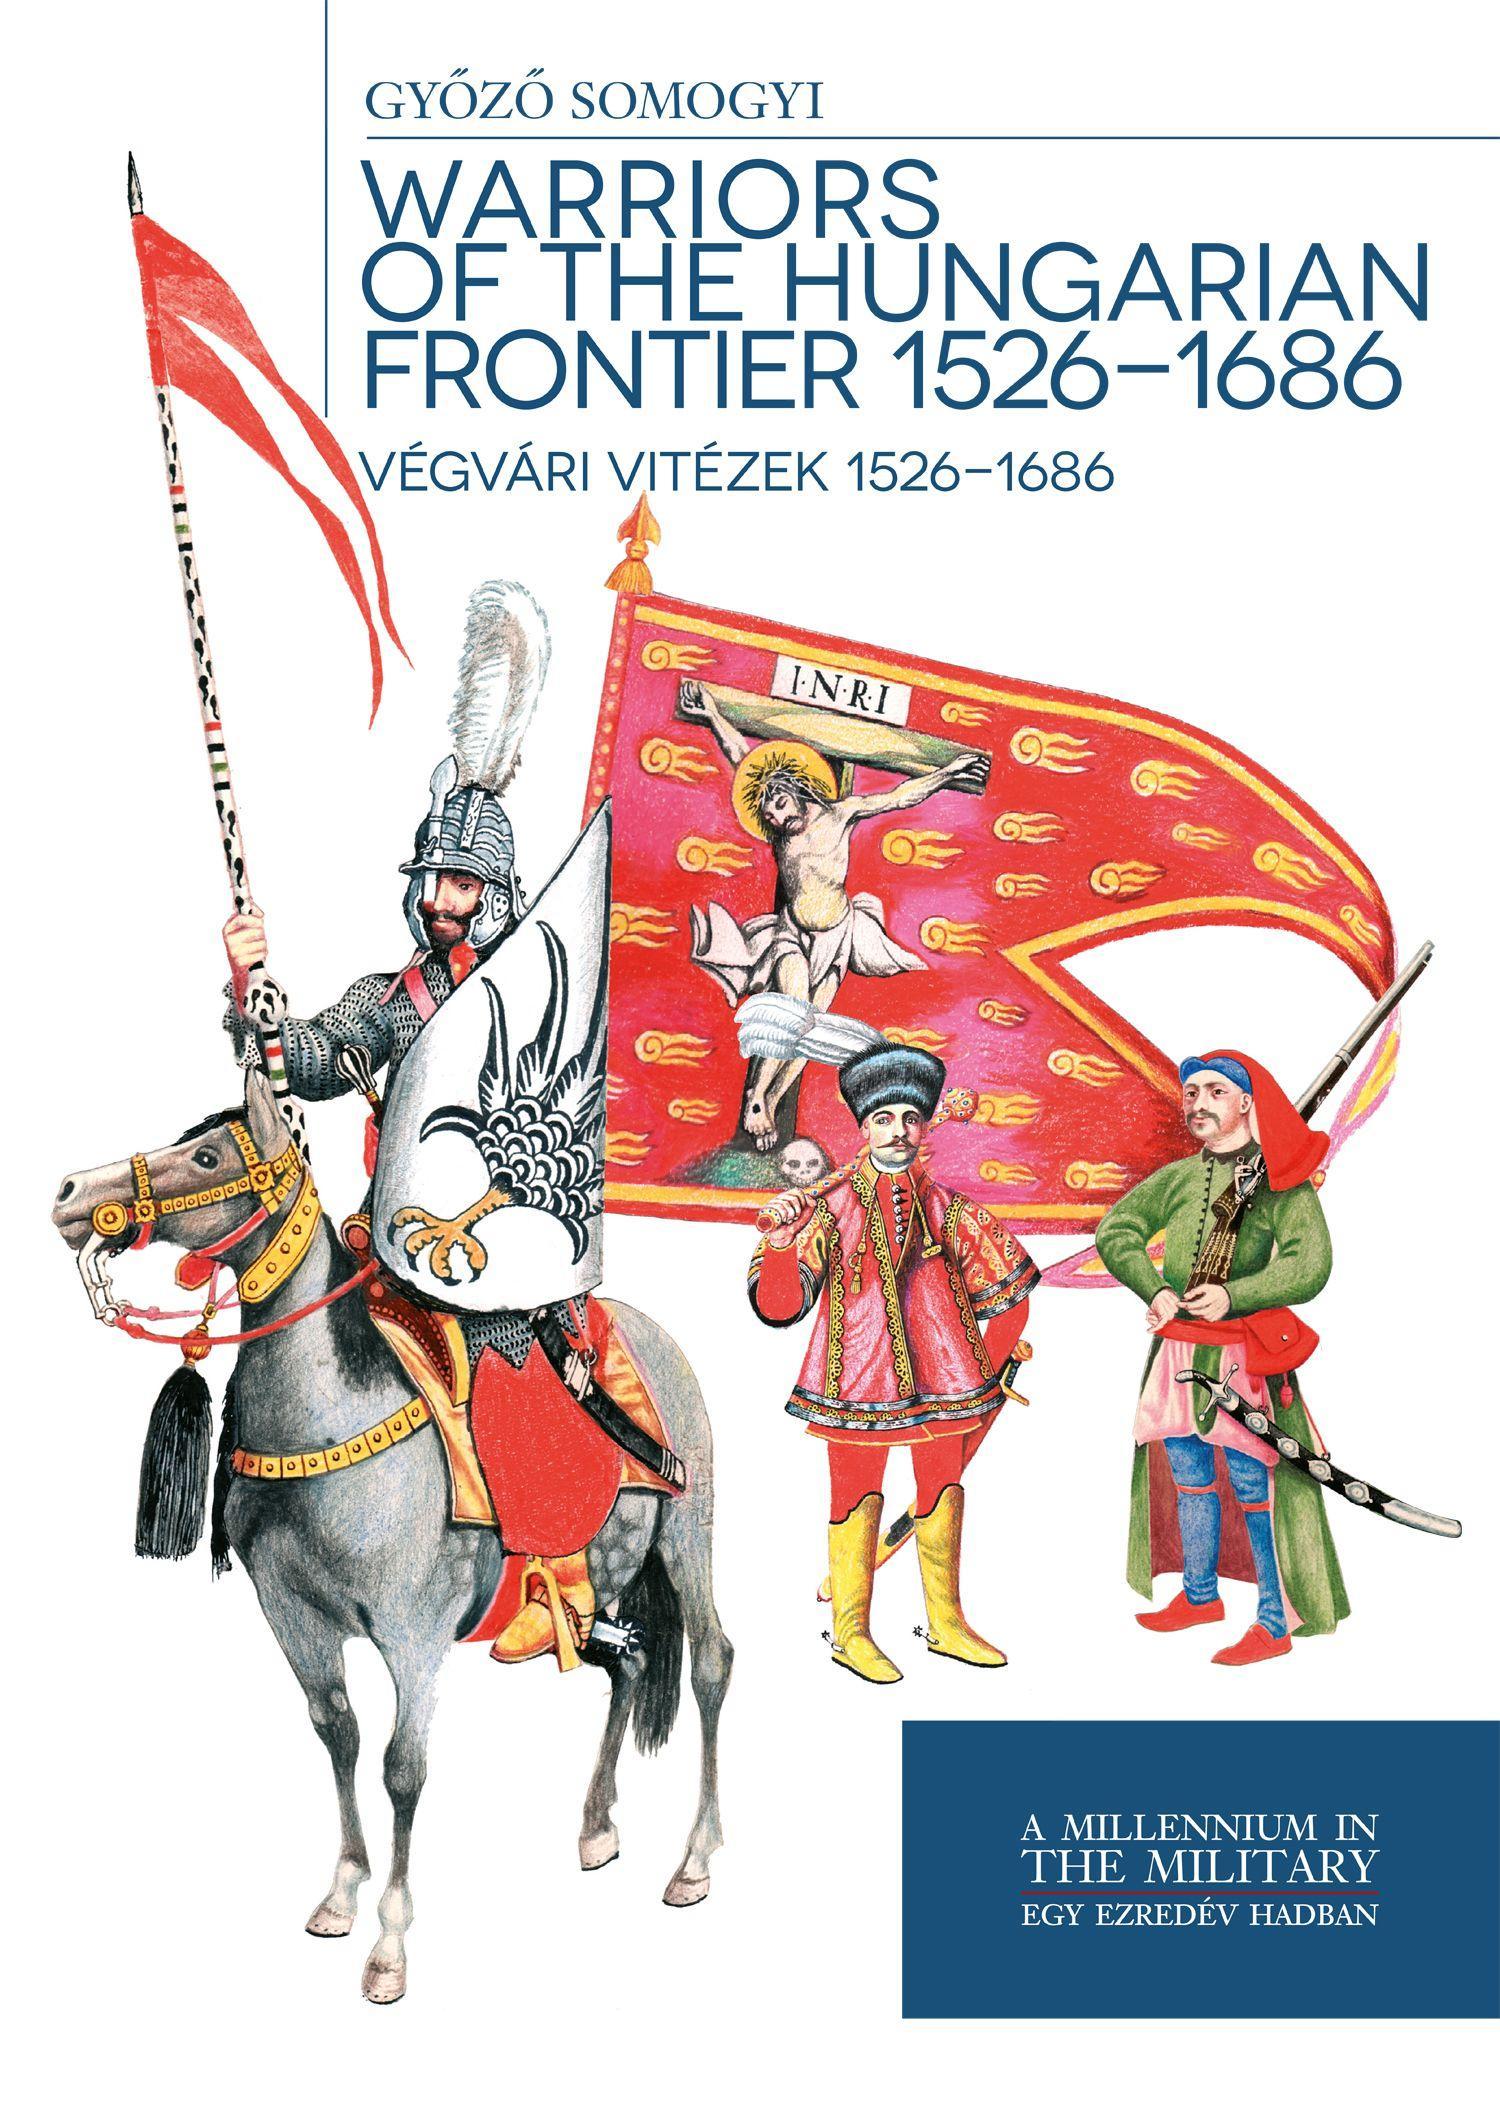 WARRIORS OF THE HUNGARIAN FRONTIER 1526-1686 - VÉGVÁRI VITÉZEK